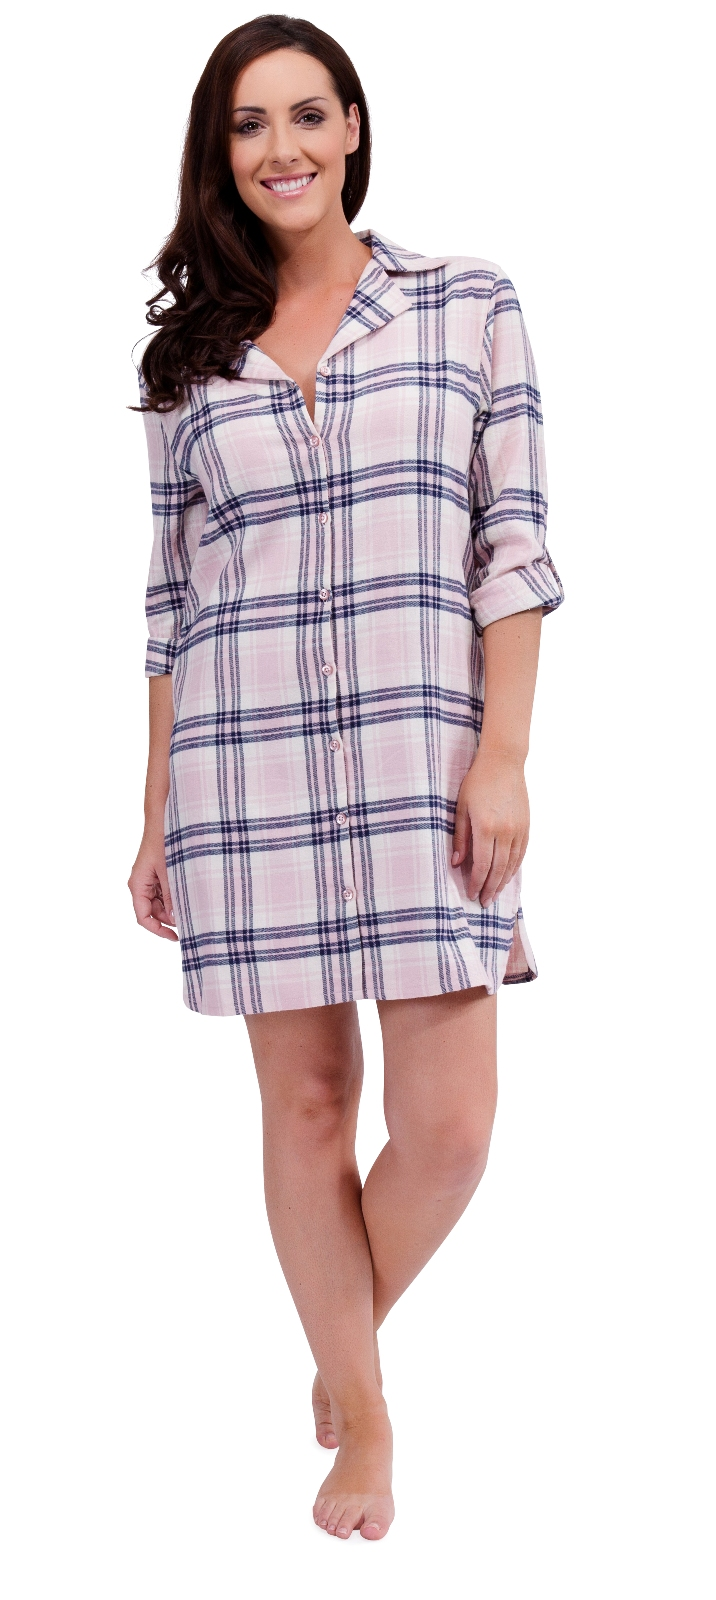 womens 100 cotton nightdress check nightshirt nighty. Black Bedroom Furniture Sets. Home Design Ideas